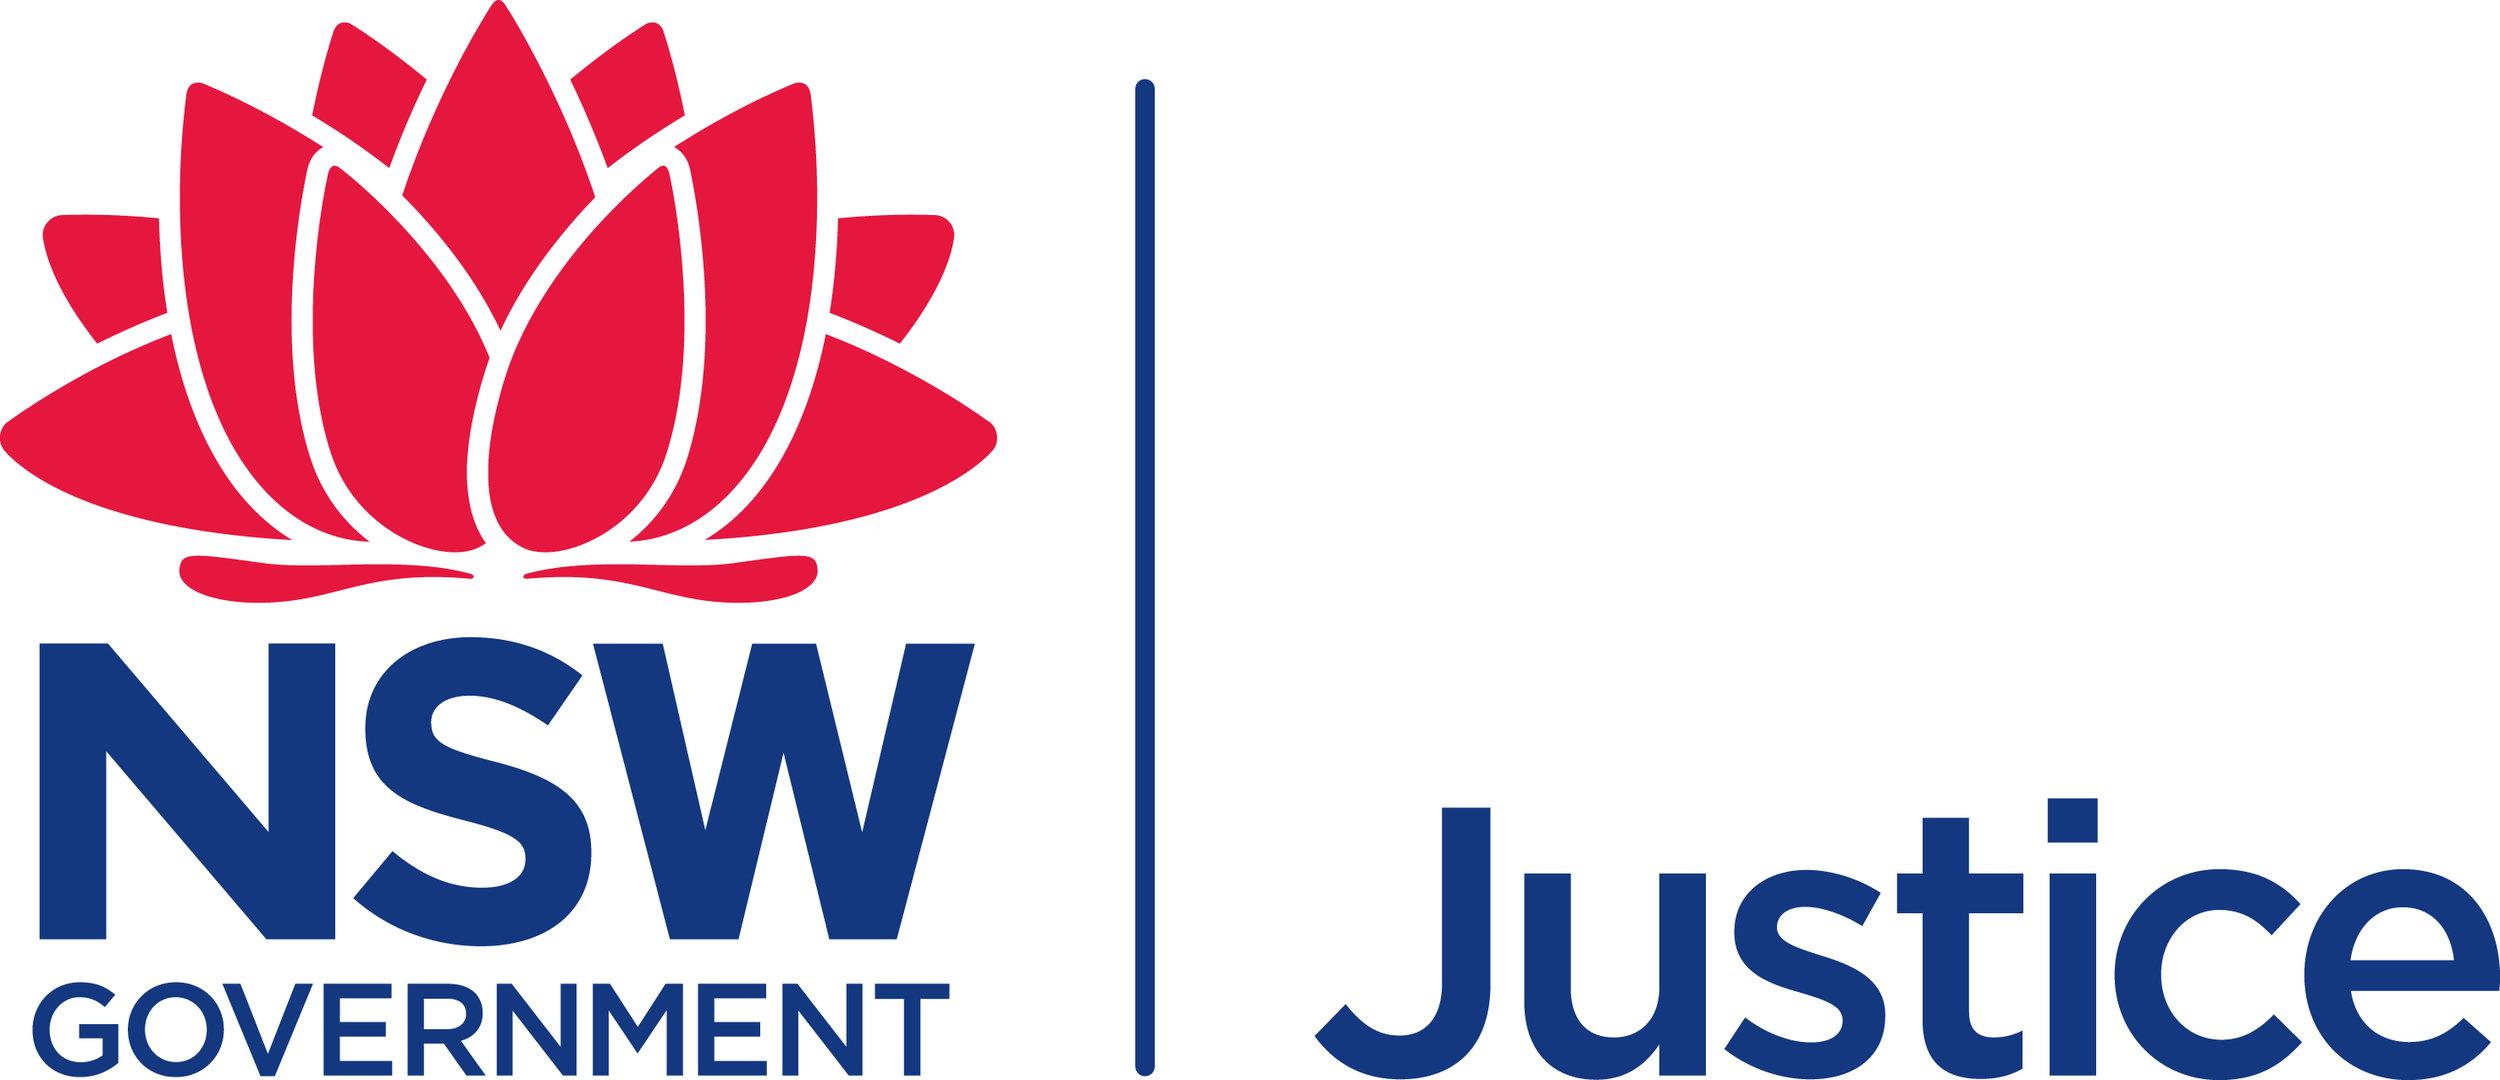 Just_NSWGOV-logo_2-col-RGB.jpg